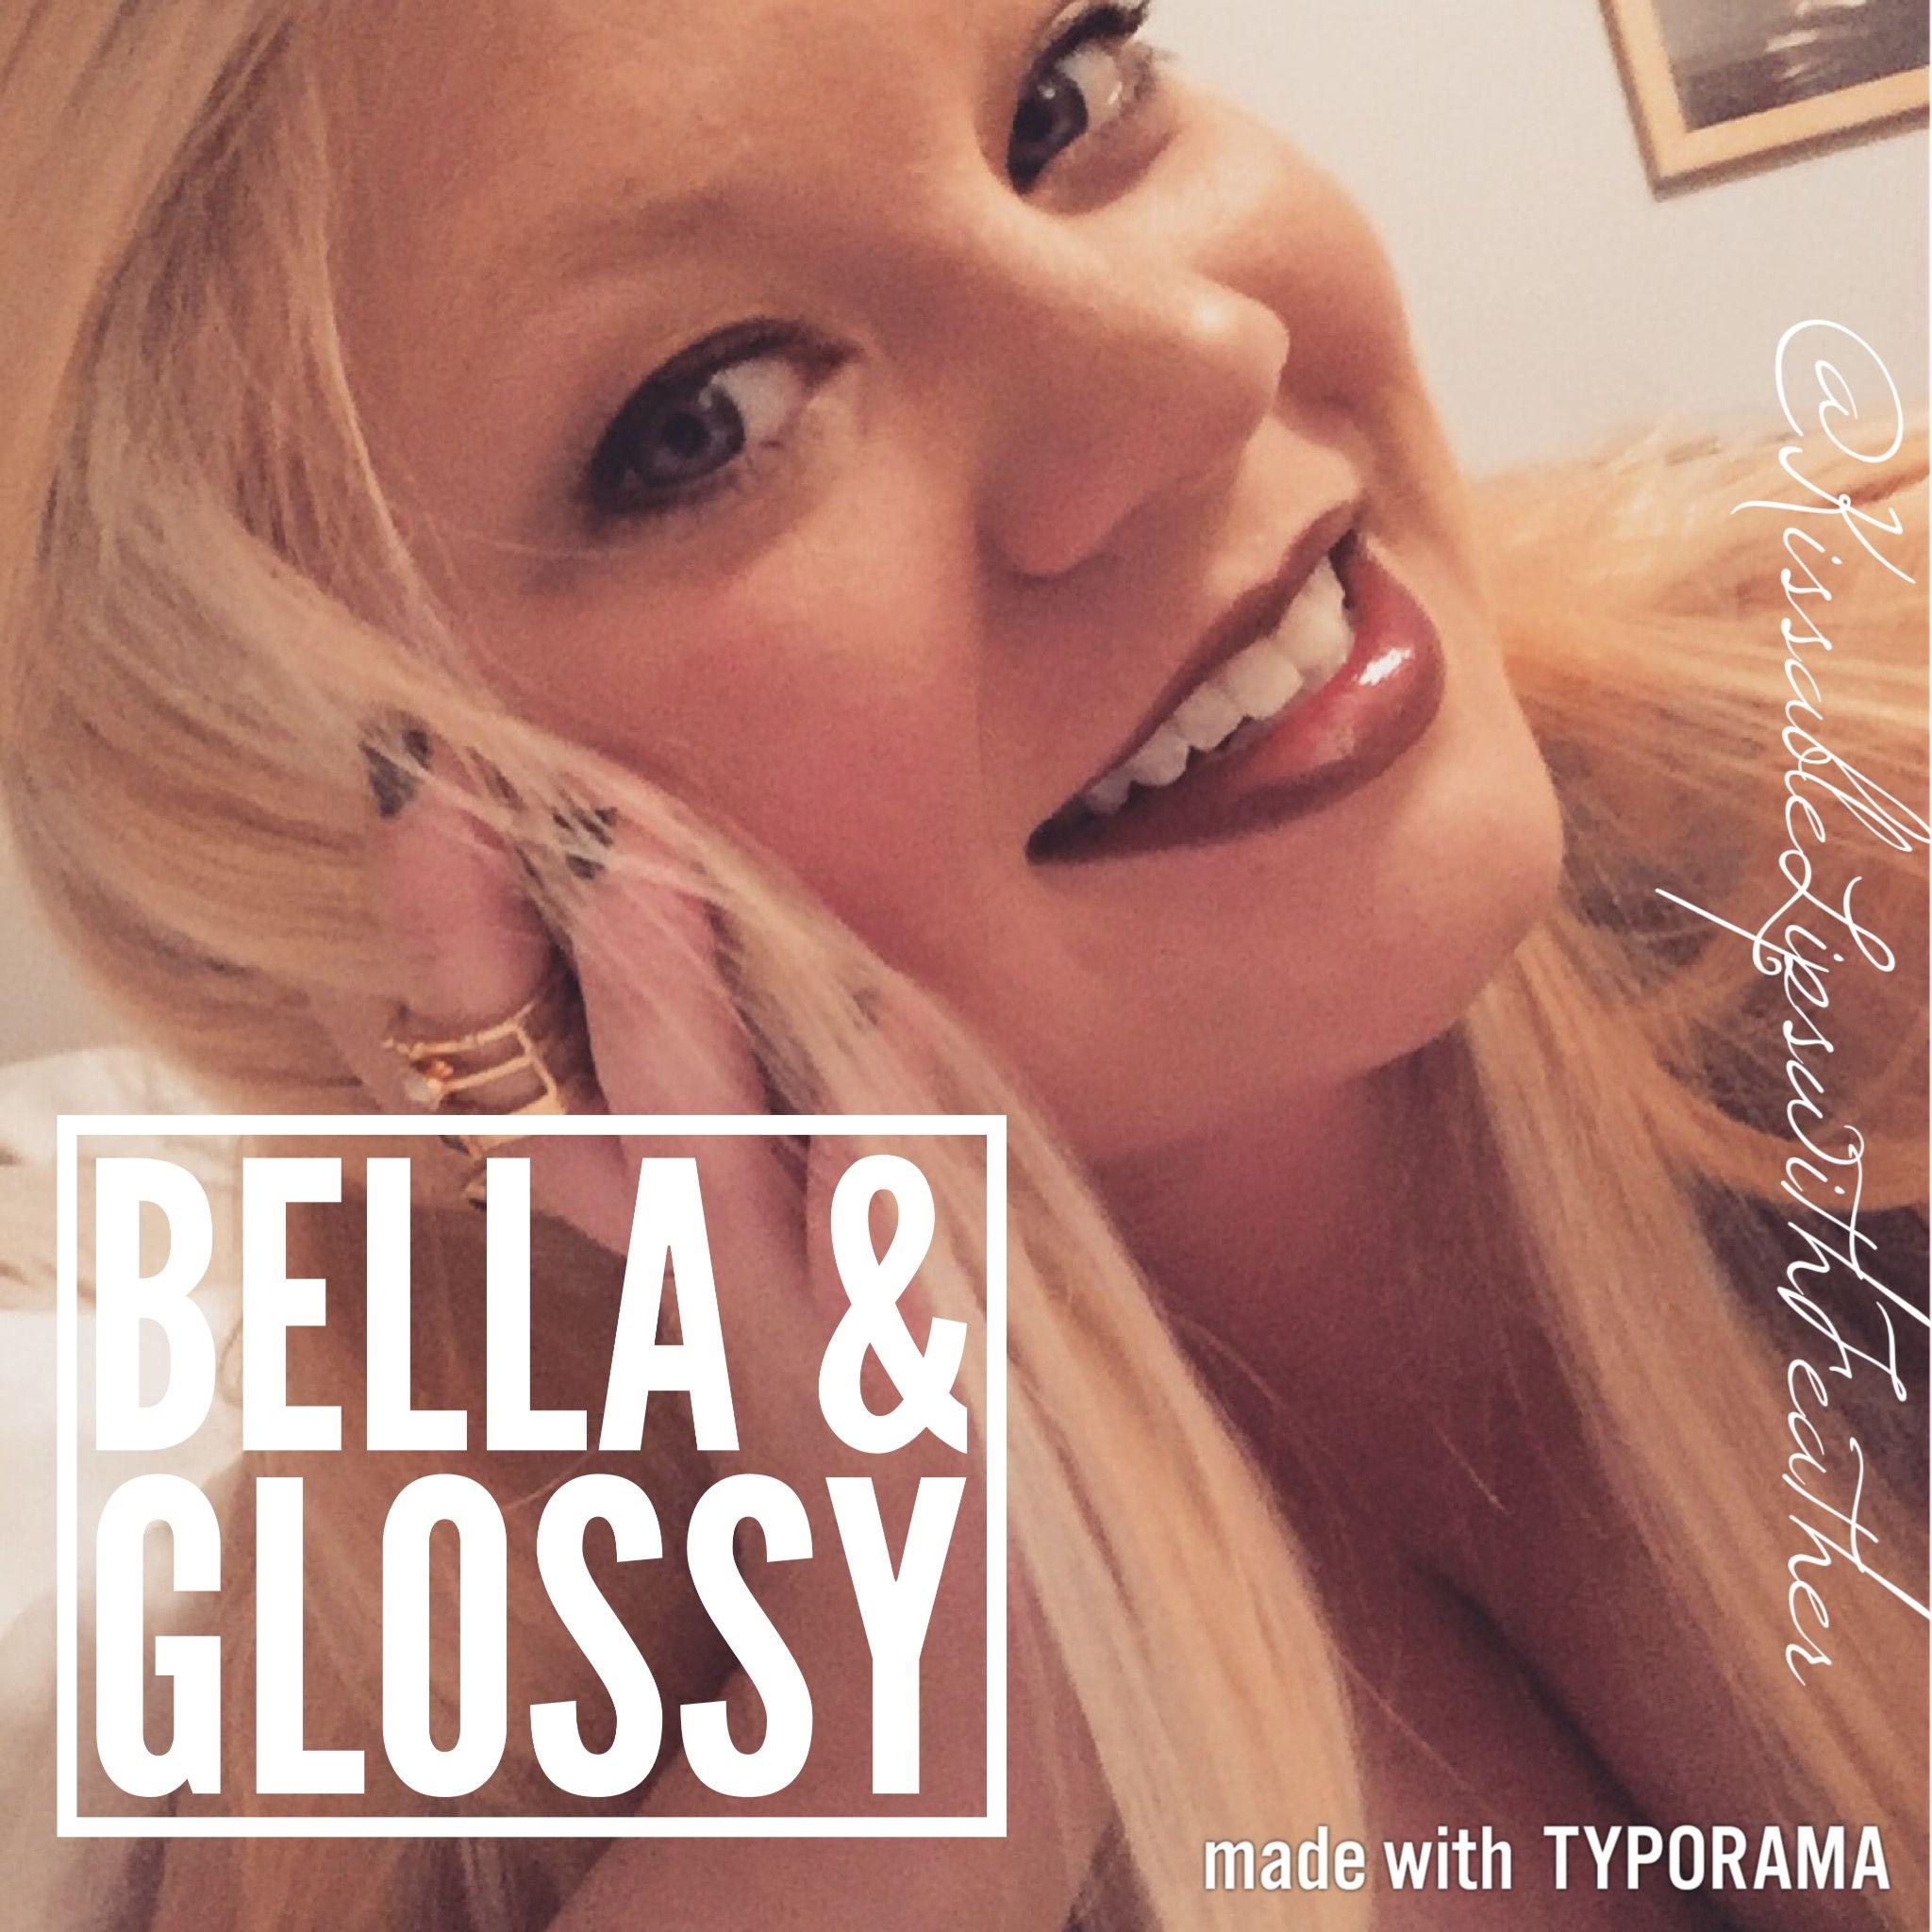 Bella LipSense!  Message to order!  #lipsense #bella #glossy #lipcolor #lippy #makeup #beauty